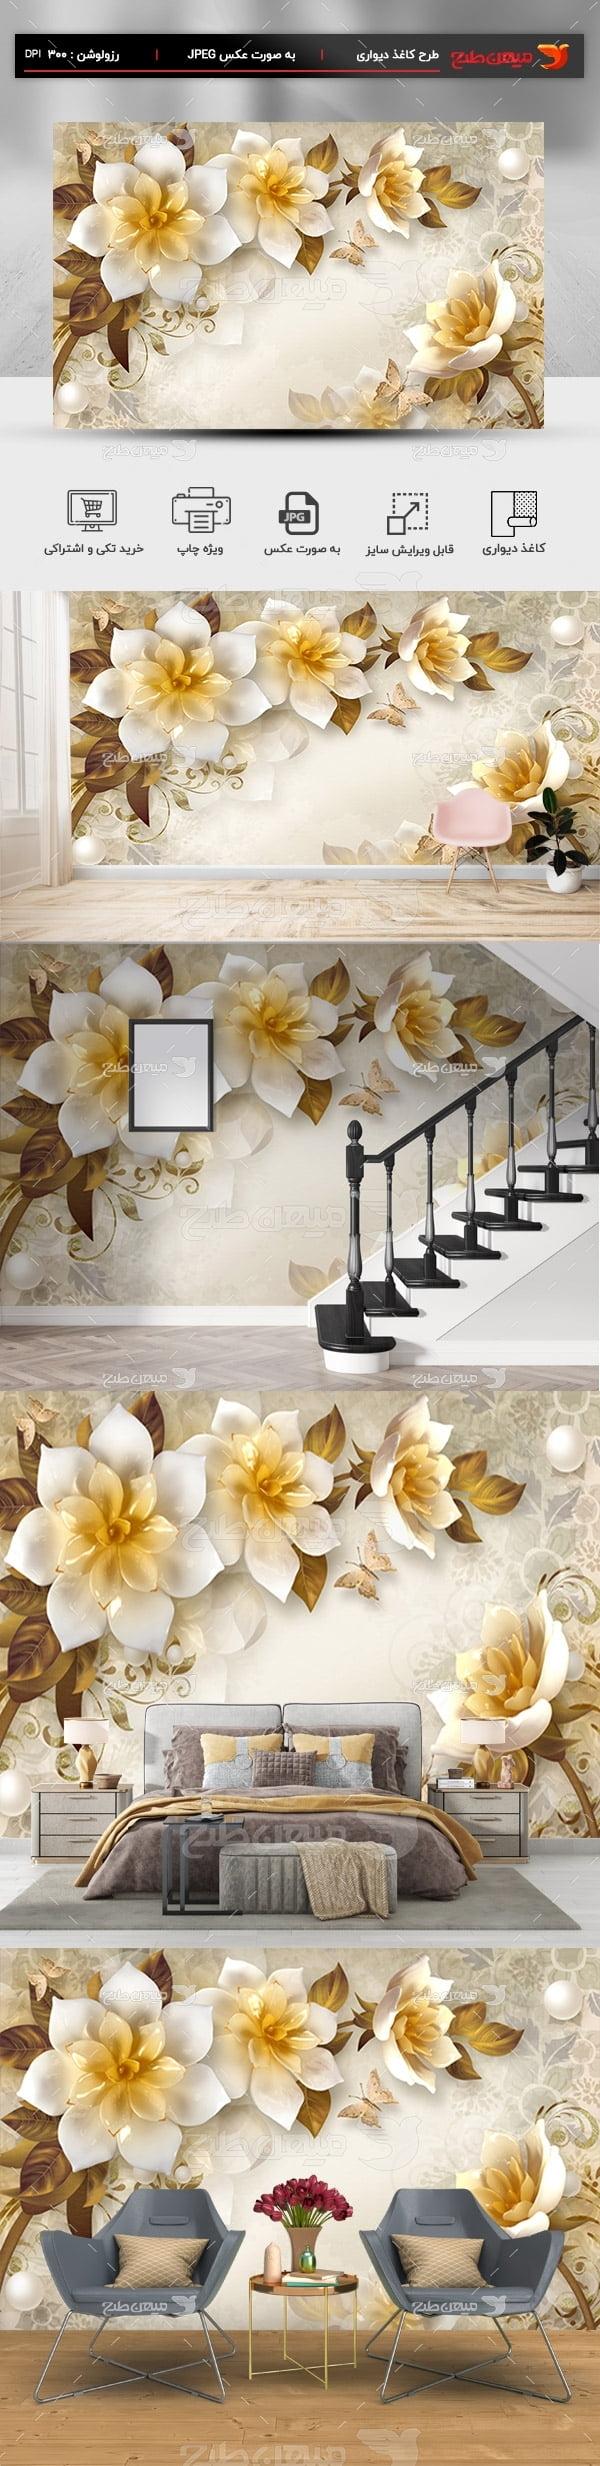 پوستر کاغذ دیواری سه بعدی گل سفید و زرد